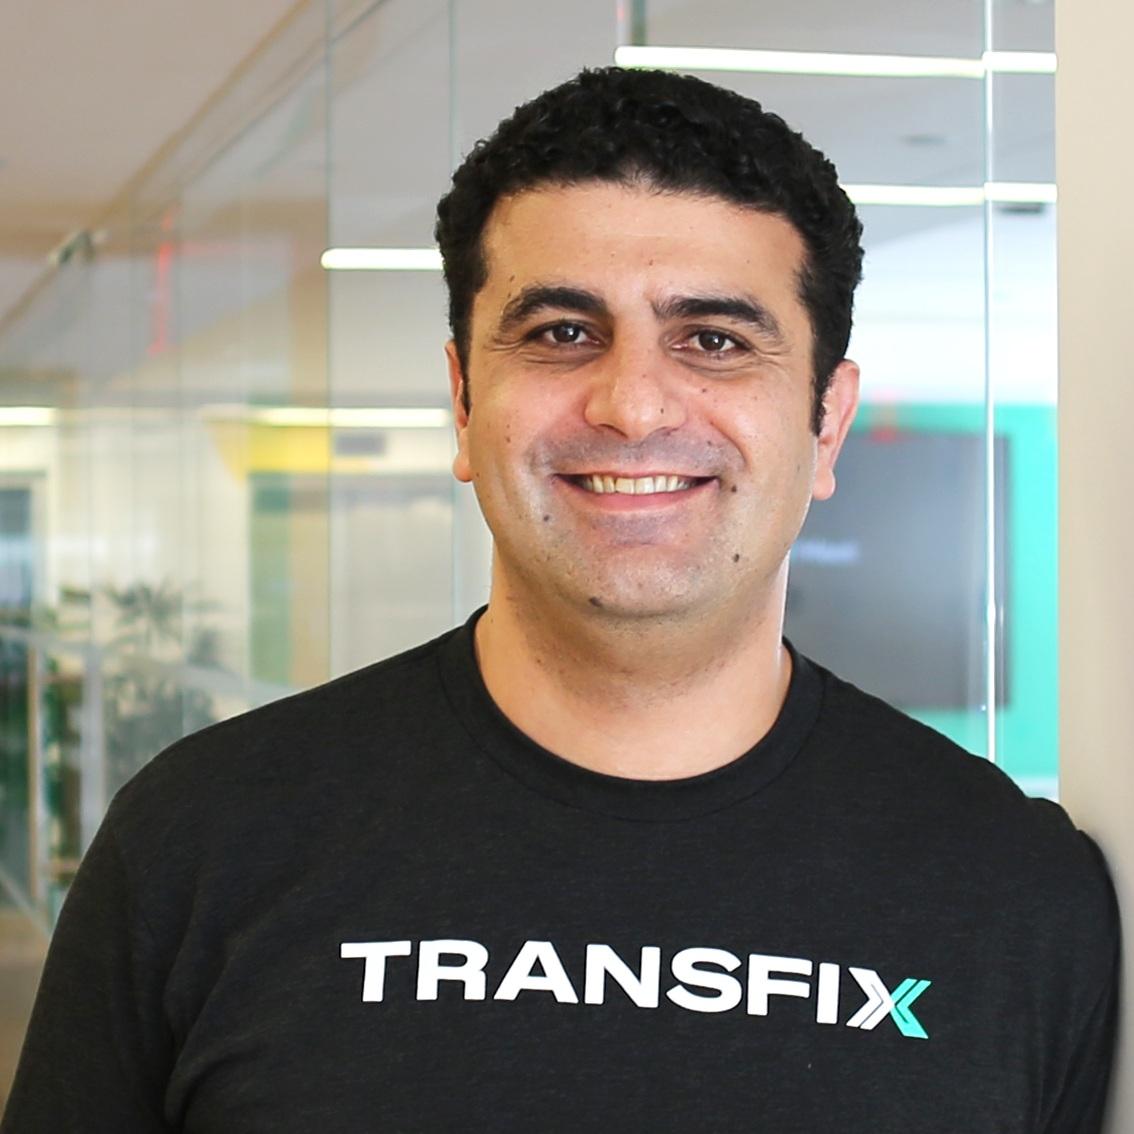 Ahmad El-Dardiry, Transfix